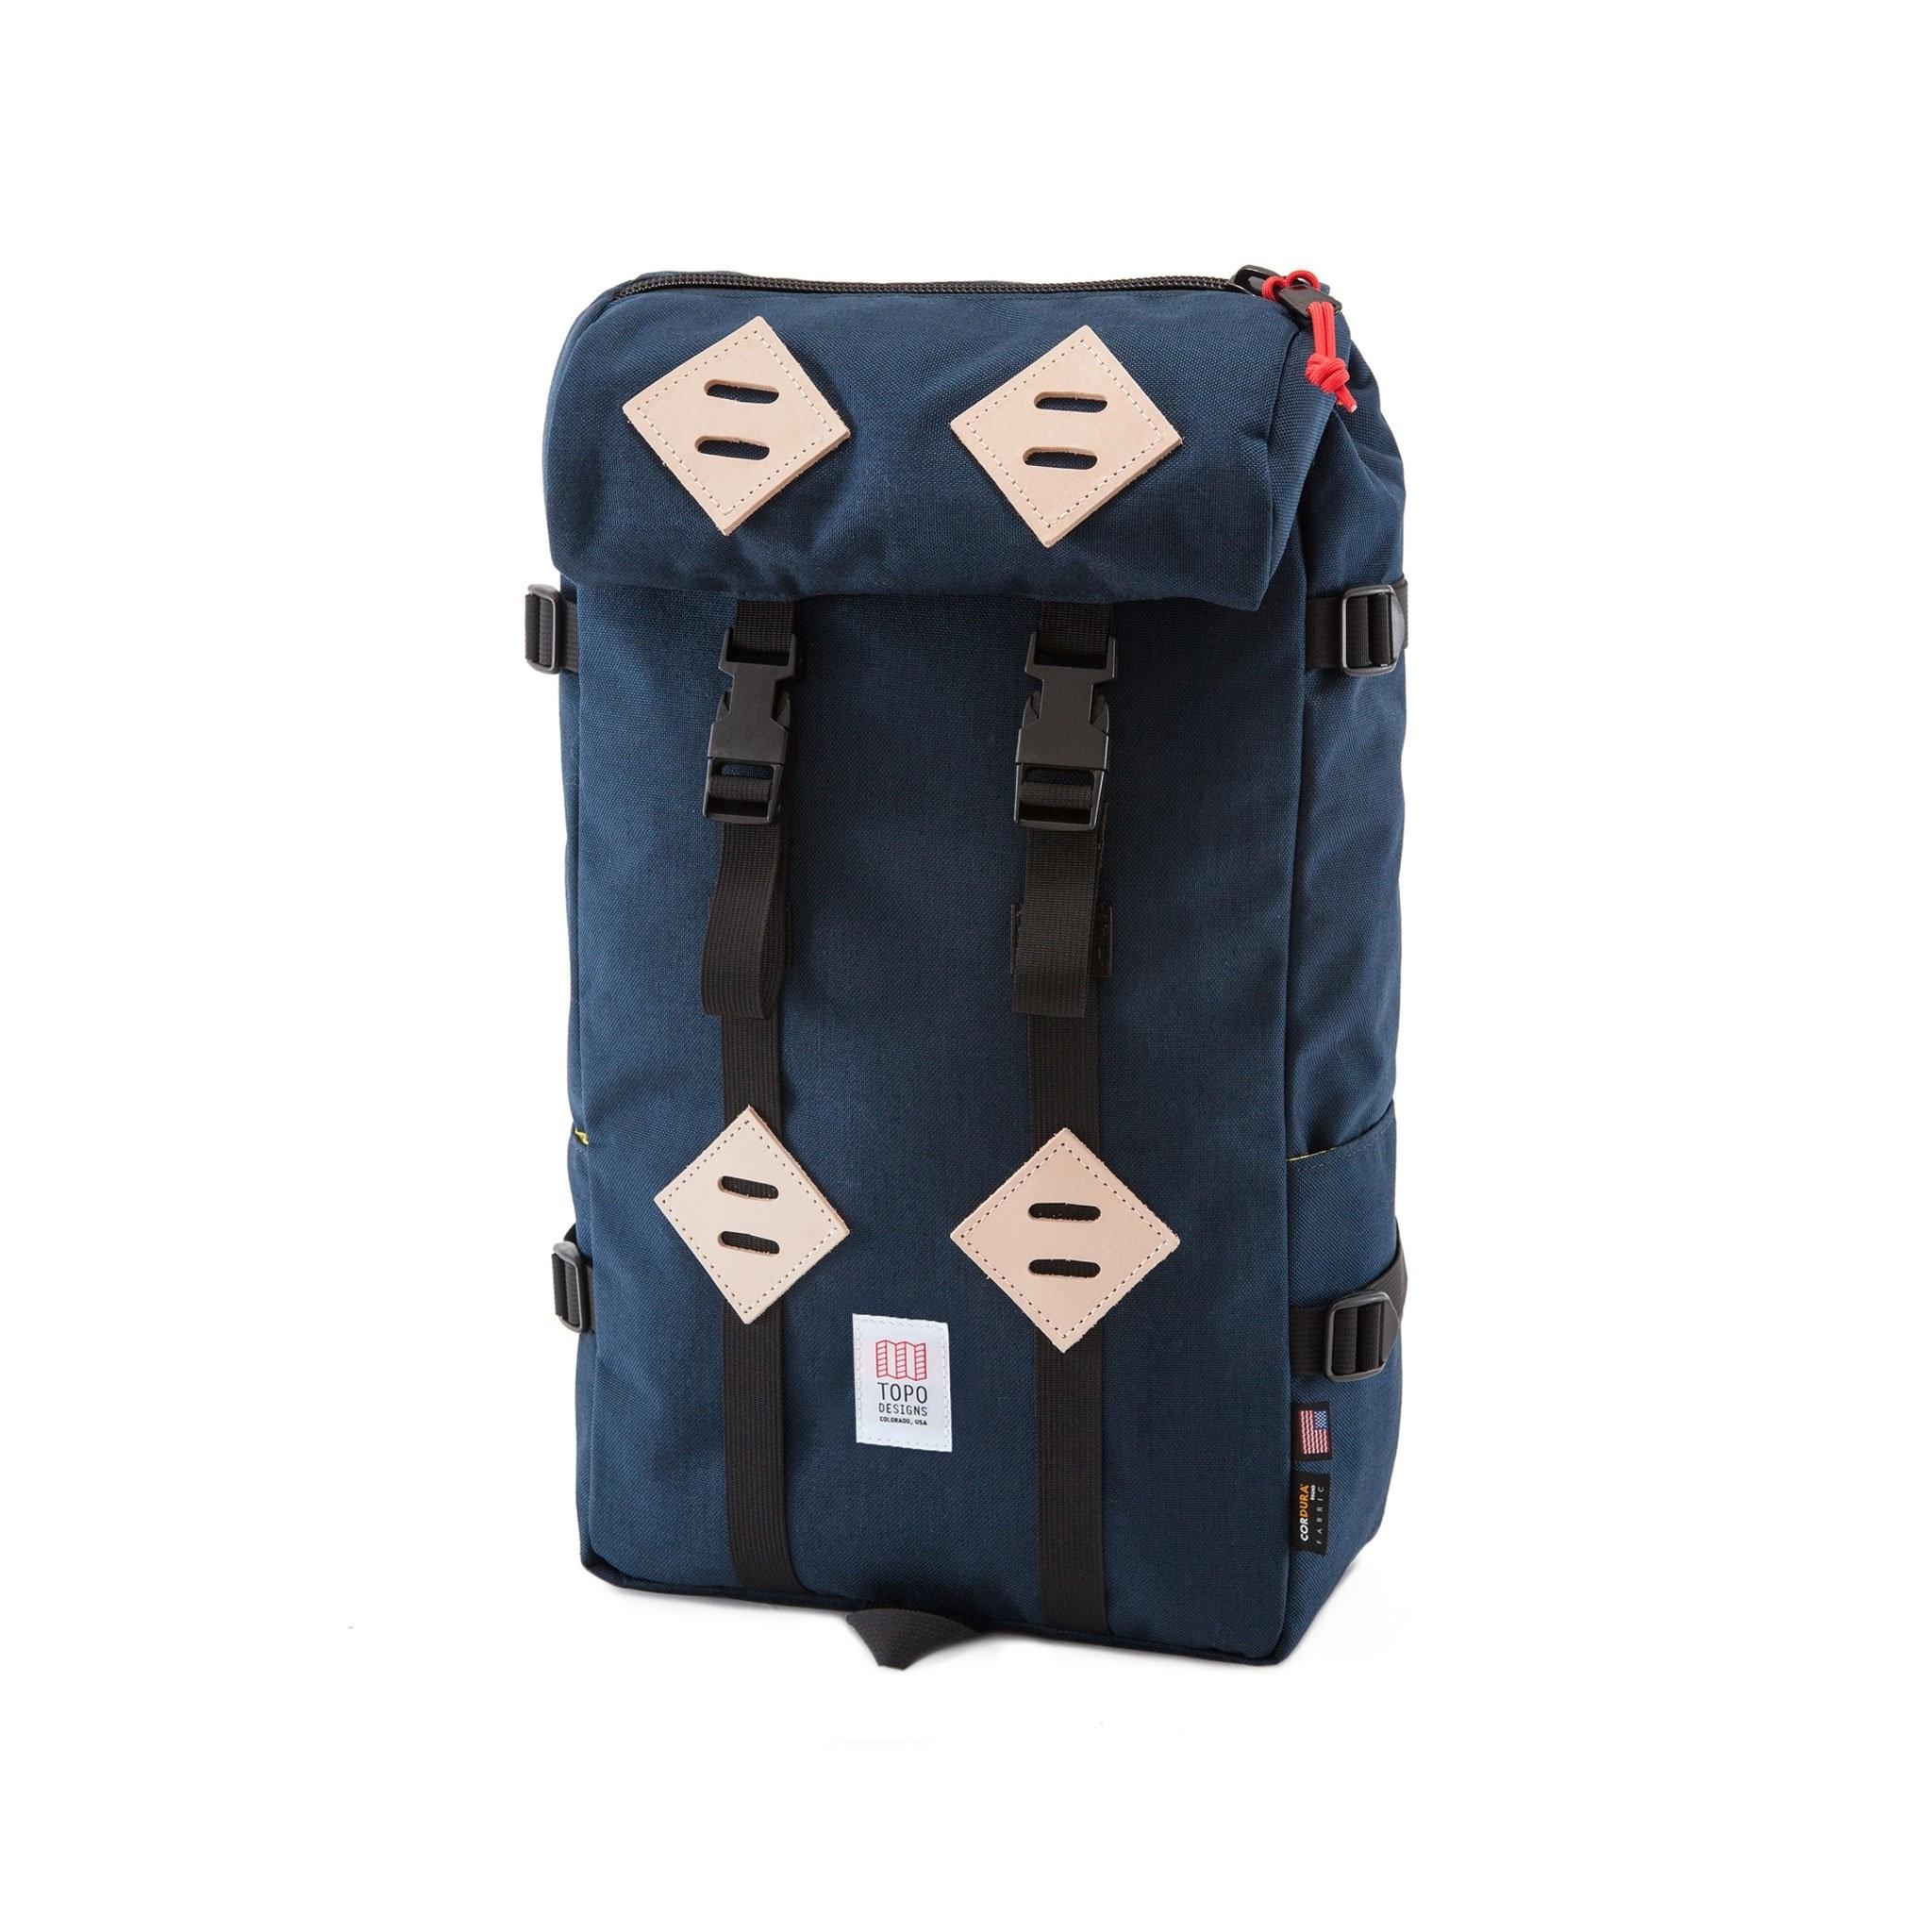 Topo Designs Klettersack 25L : Navy